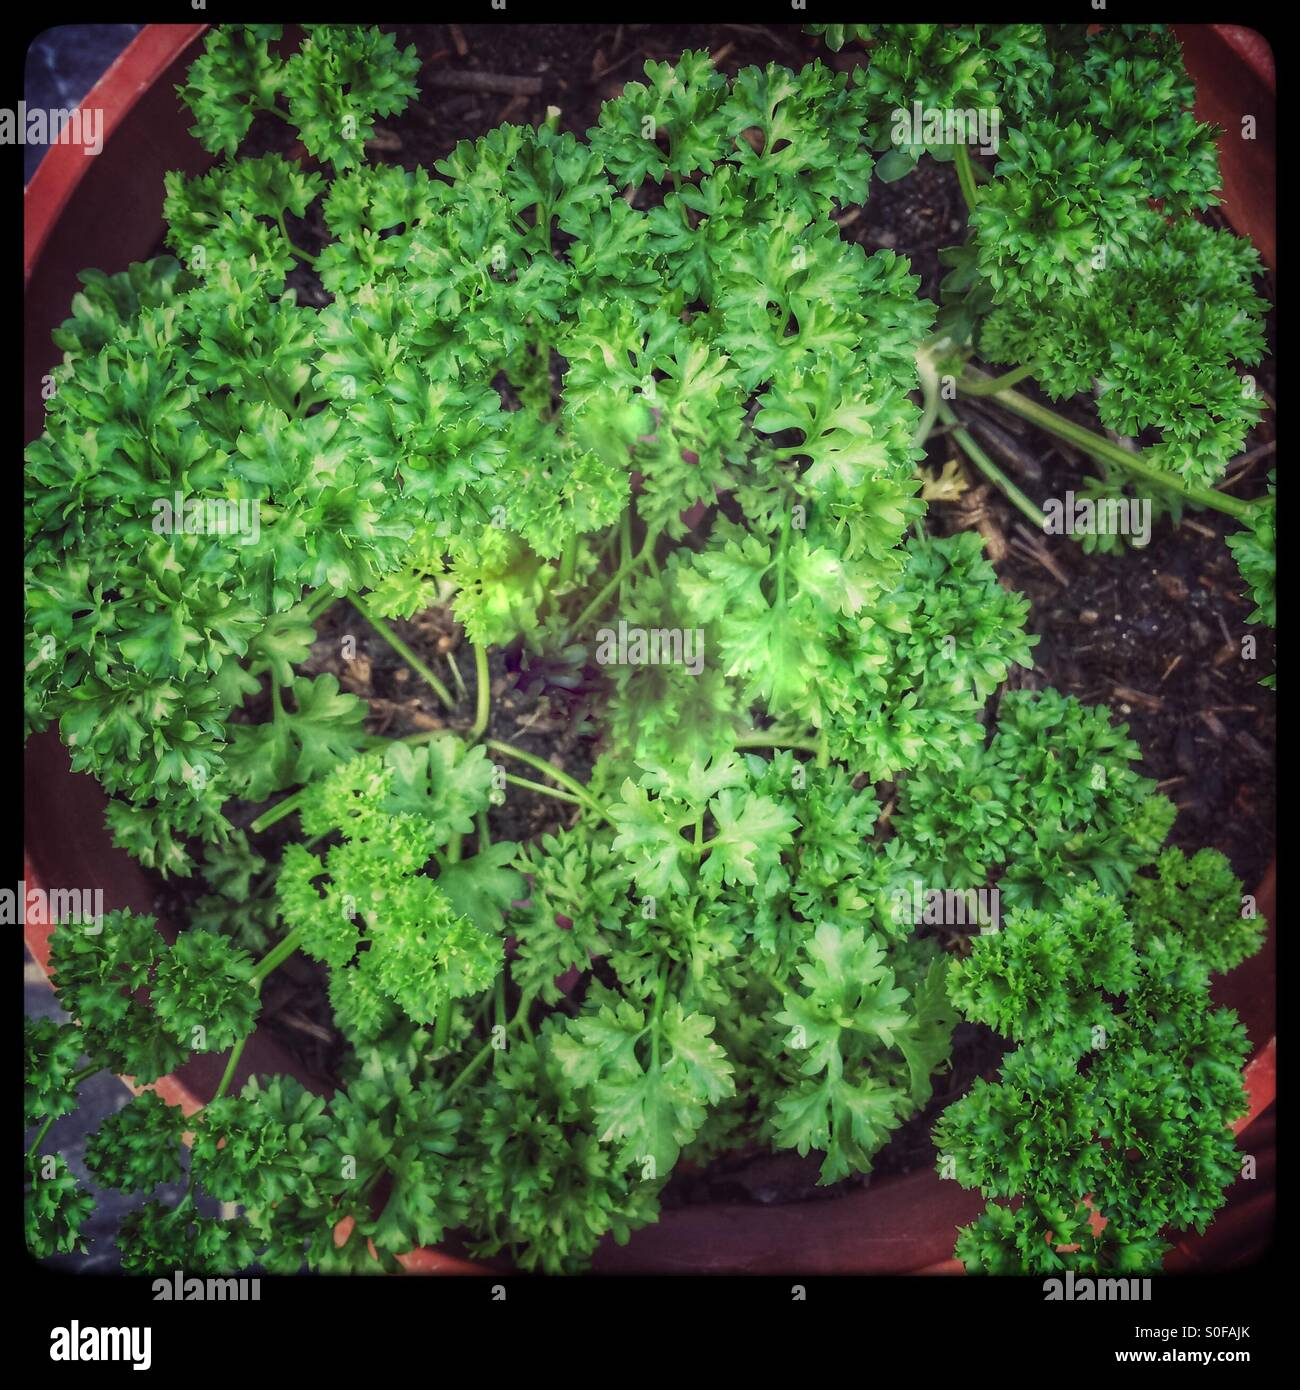 parsley pot photos parsley pot images alamy. Black Bedroom Furniture Sets. Home Design Ideas